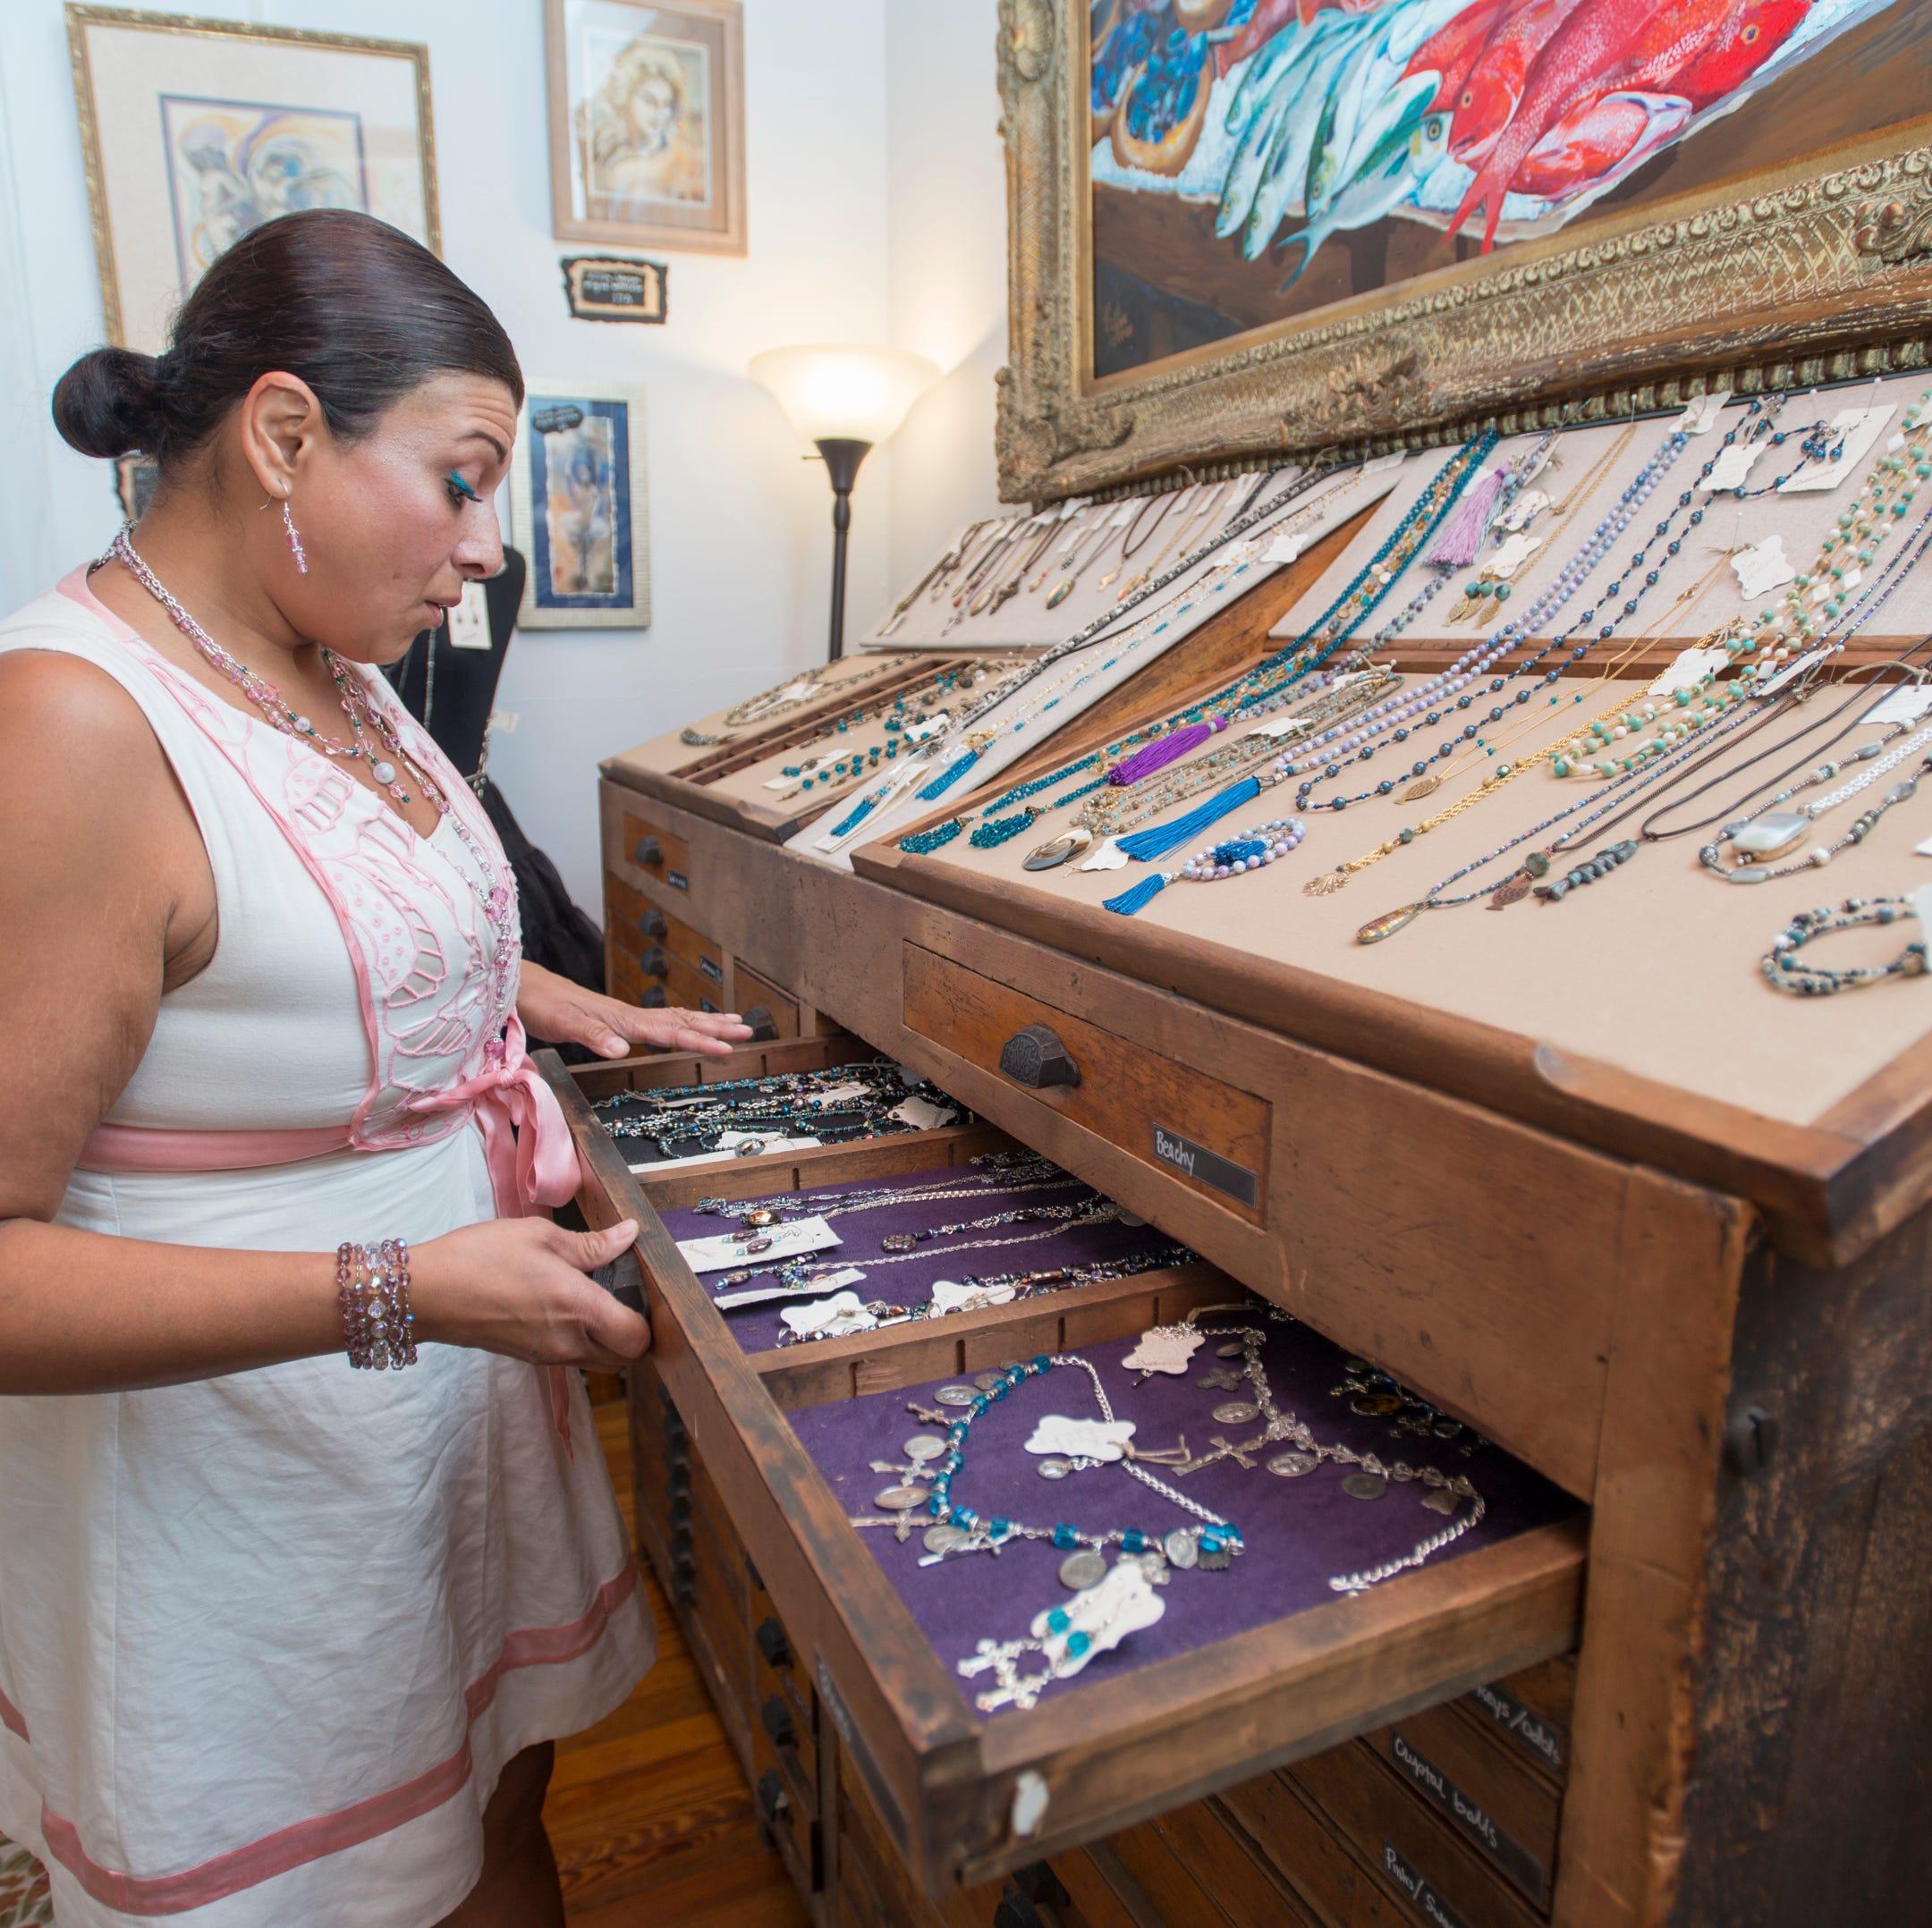 Ann David Gallery in East Hill brings art back home